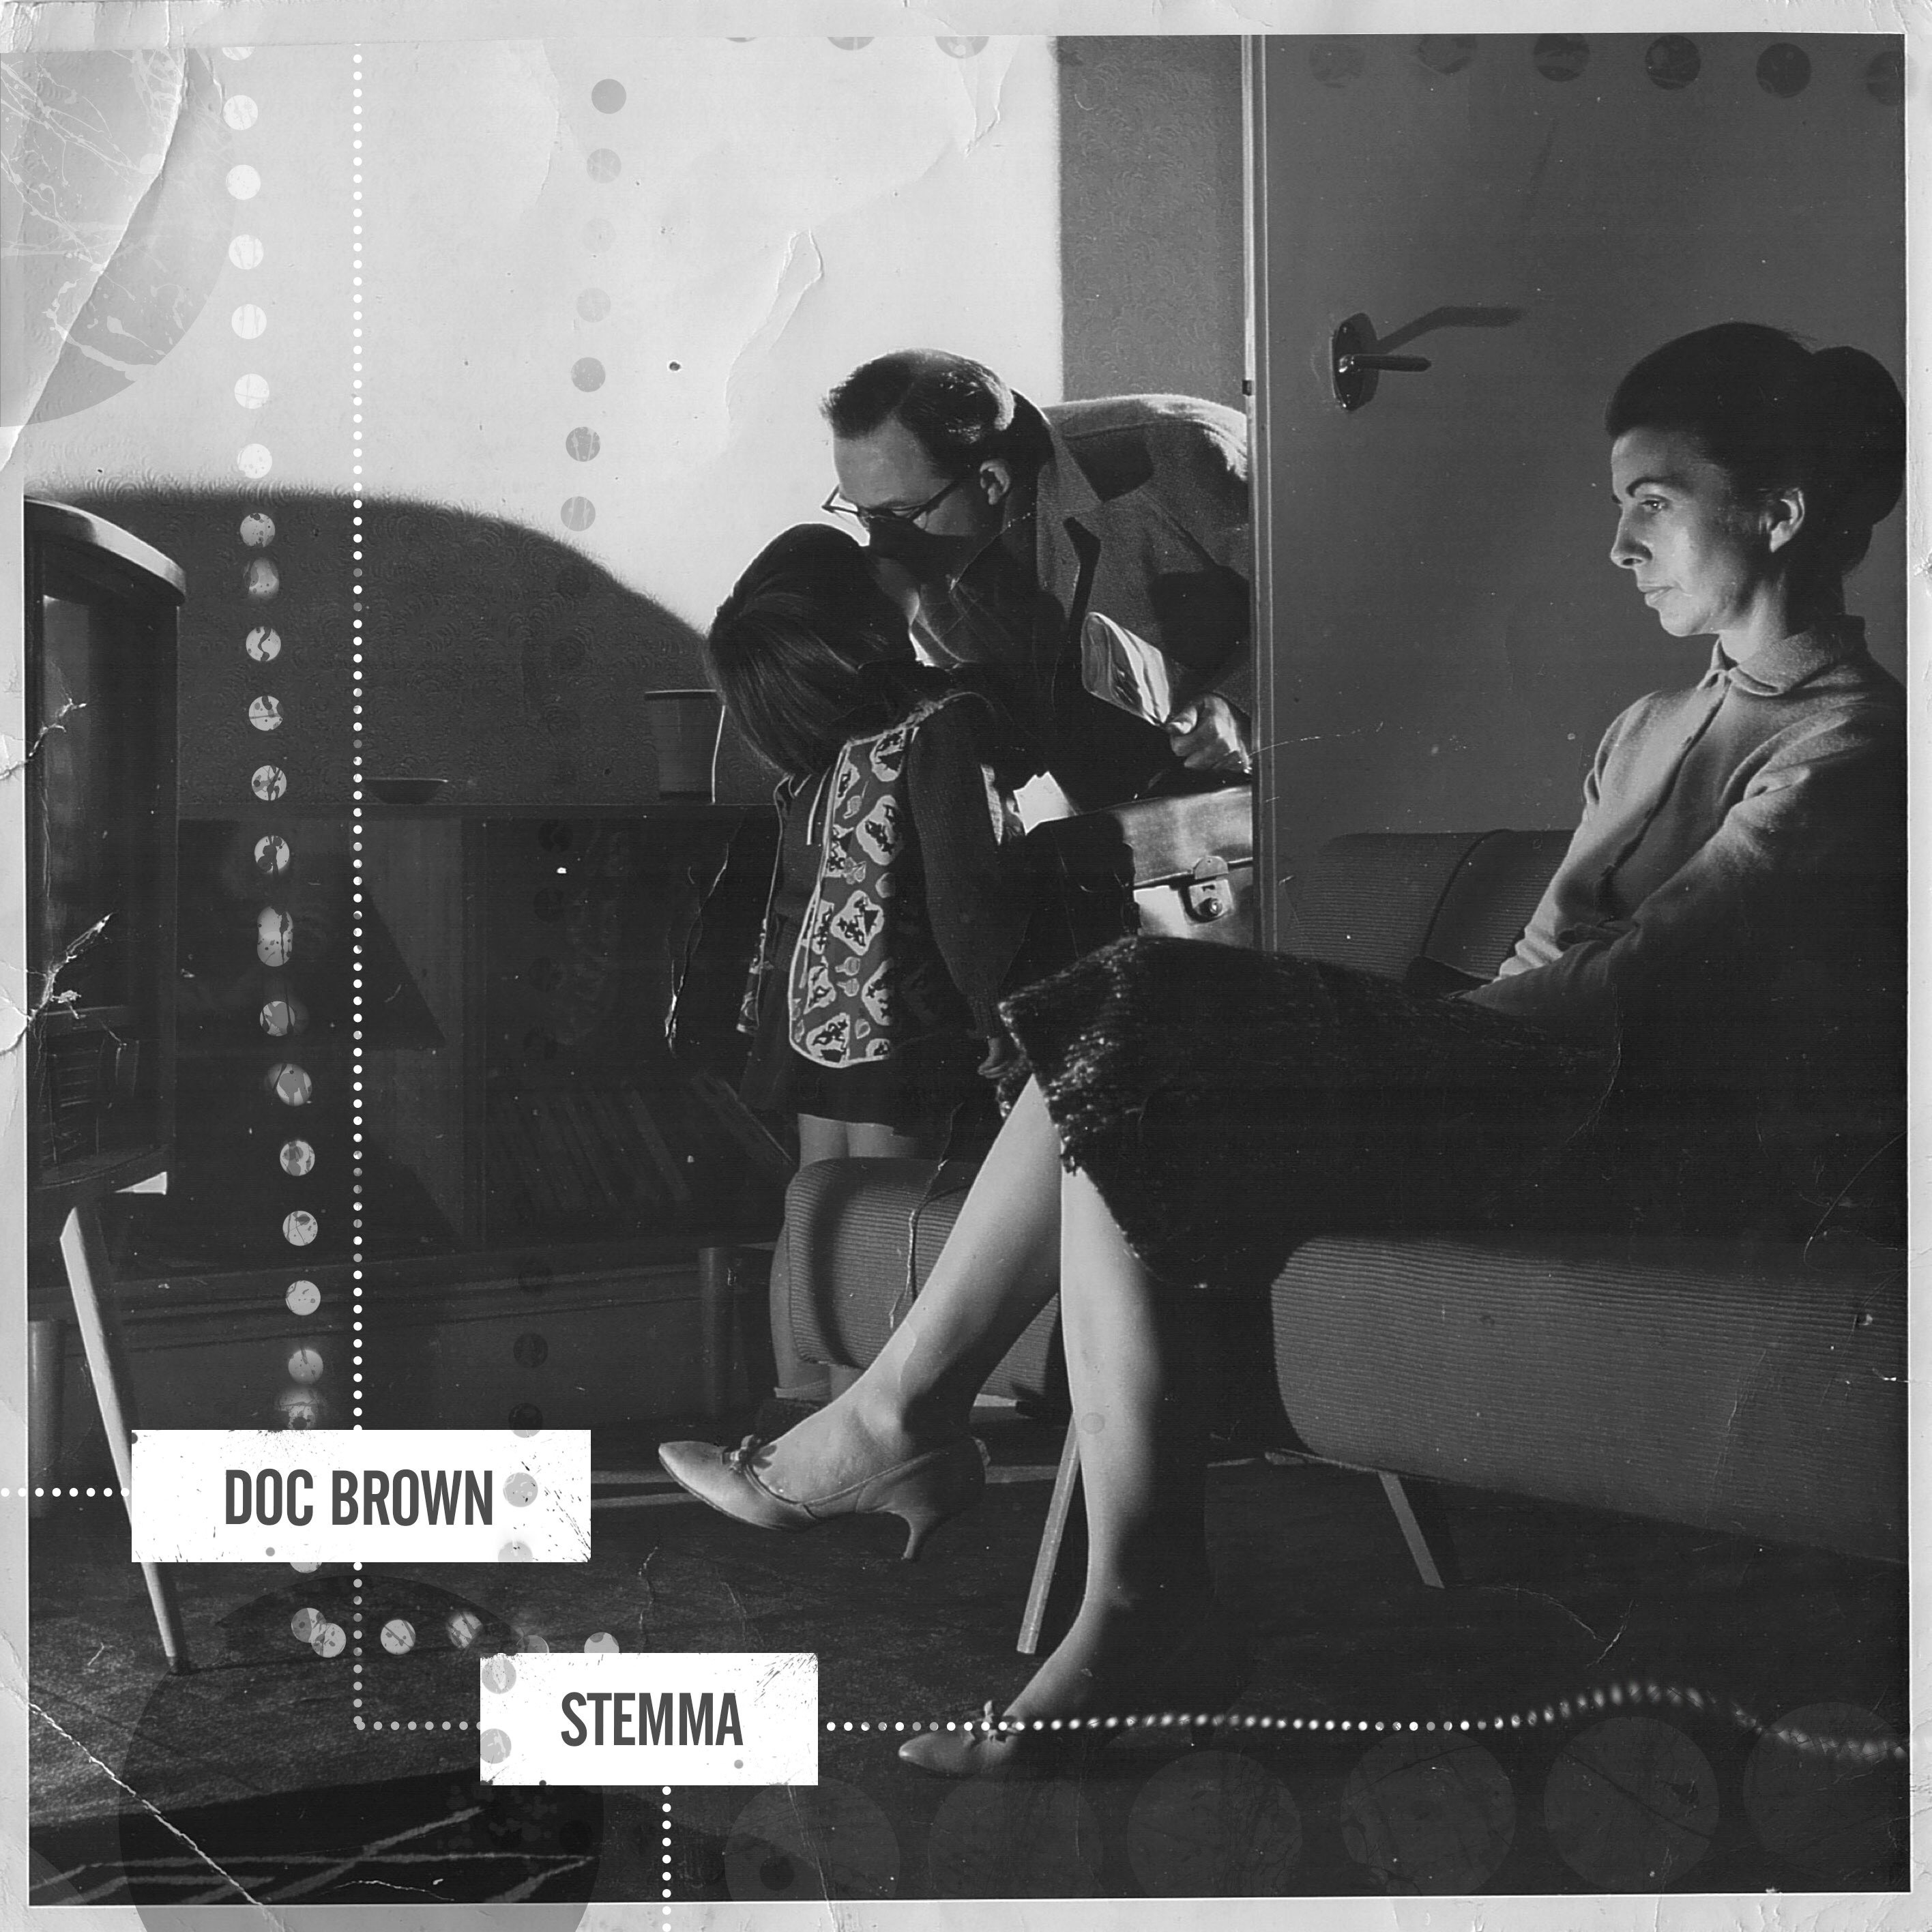 Stemma: CD Album - Doc Brown